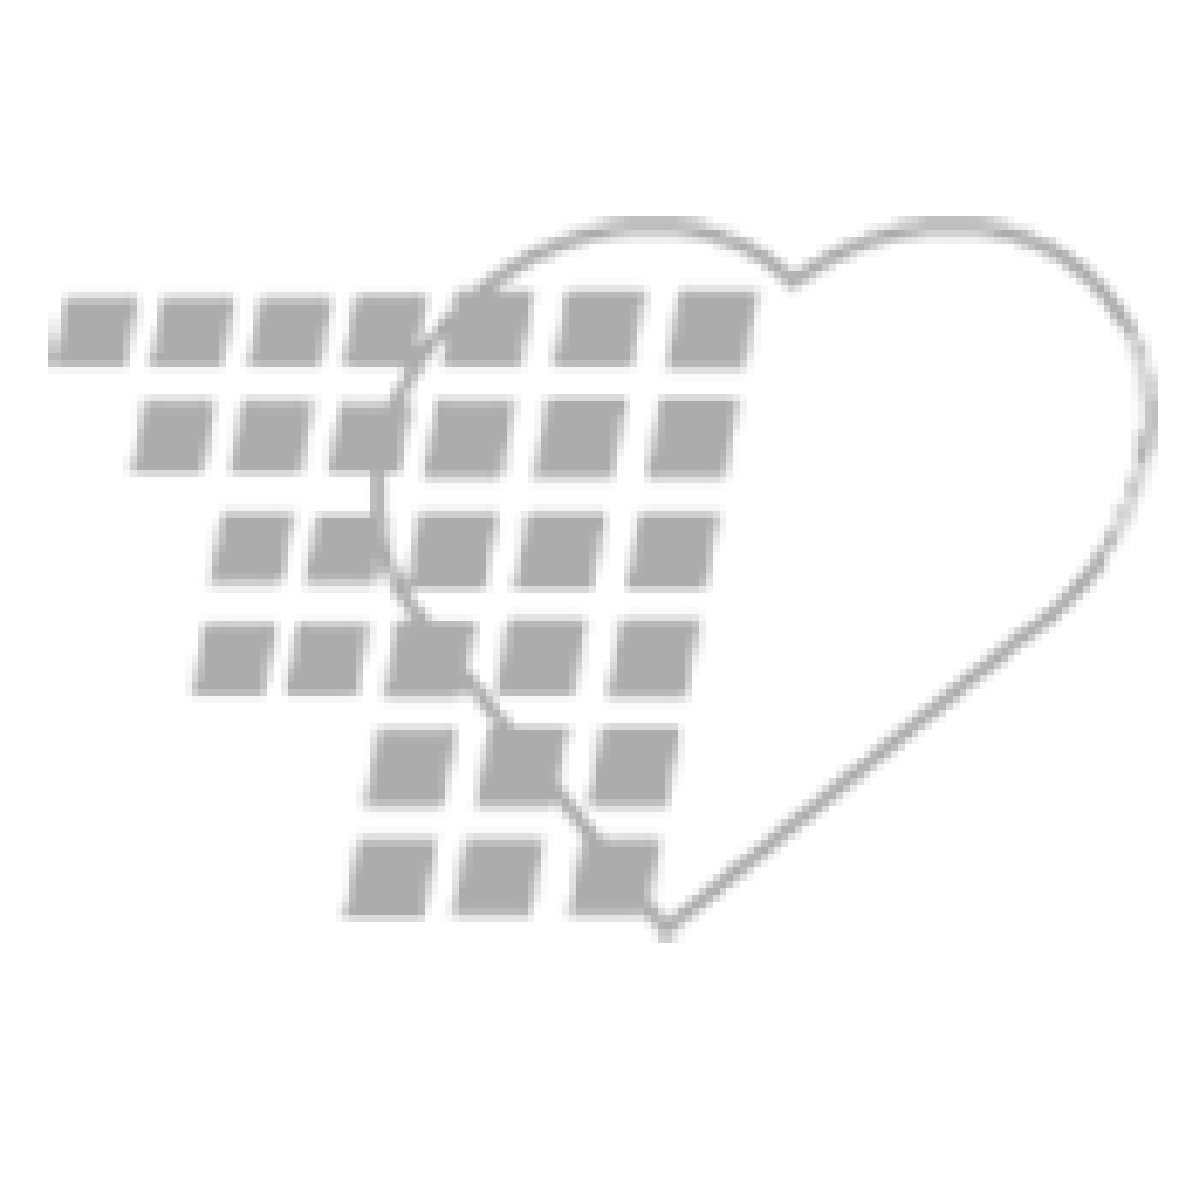 11-81-0930-FULL PRO Catheterization Simulator Set